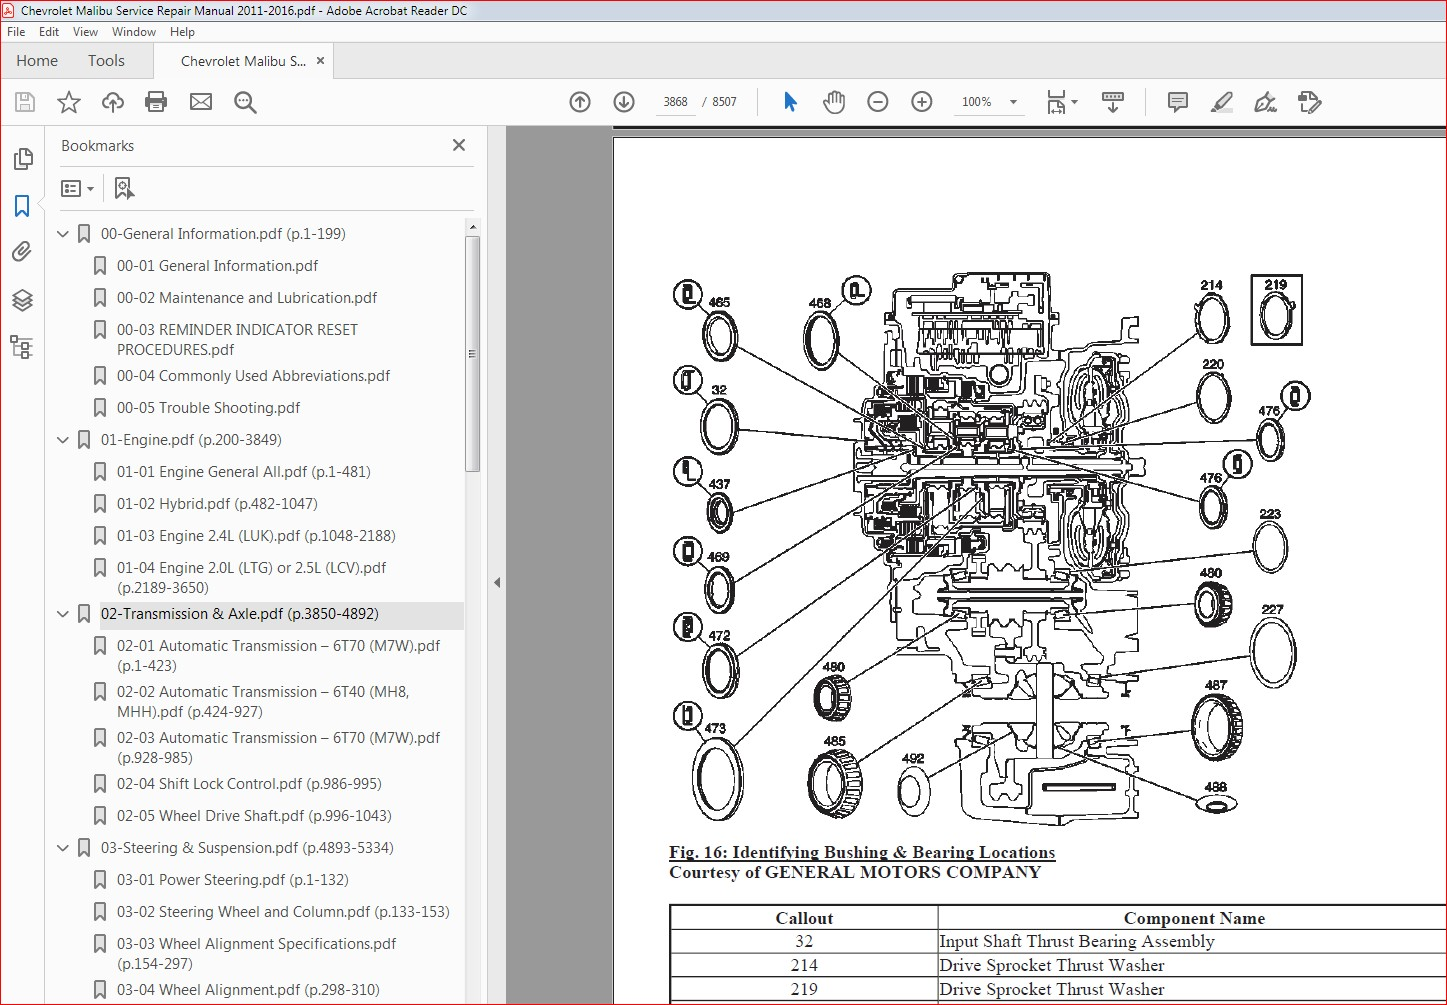 Fuse Box Diagram Chevrolet Malibu 2016 Manual Guide